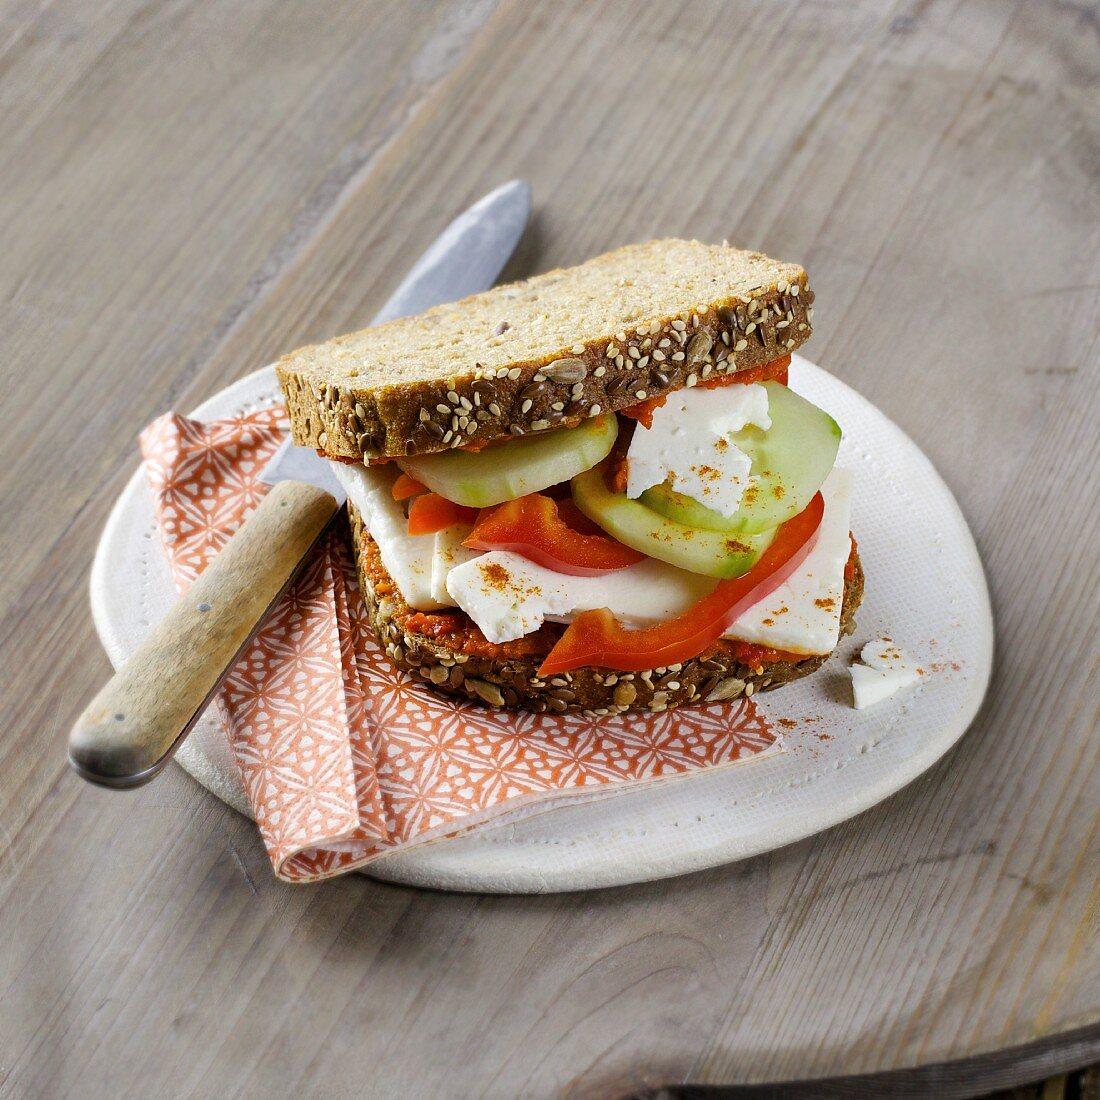 A 'Crete-style' pepper, feta cheese and cucumber sandwich